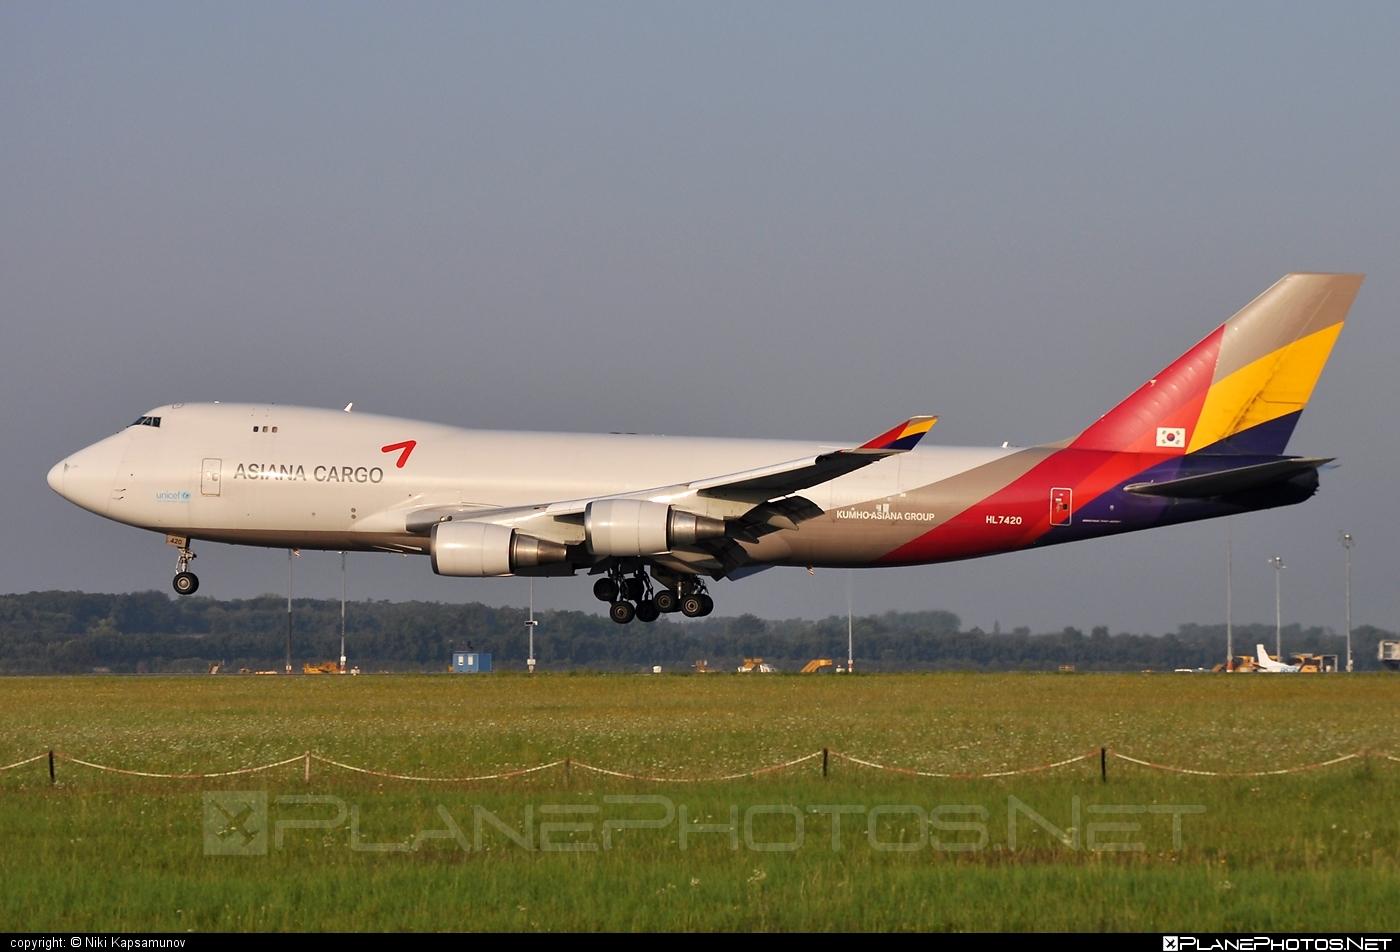 Boeing 747-400F - HL7420 operated by Asiana Cargo #asianacargo #b747 #boeing #boeing747 #jumbo